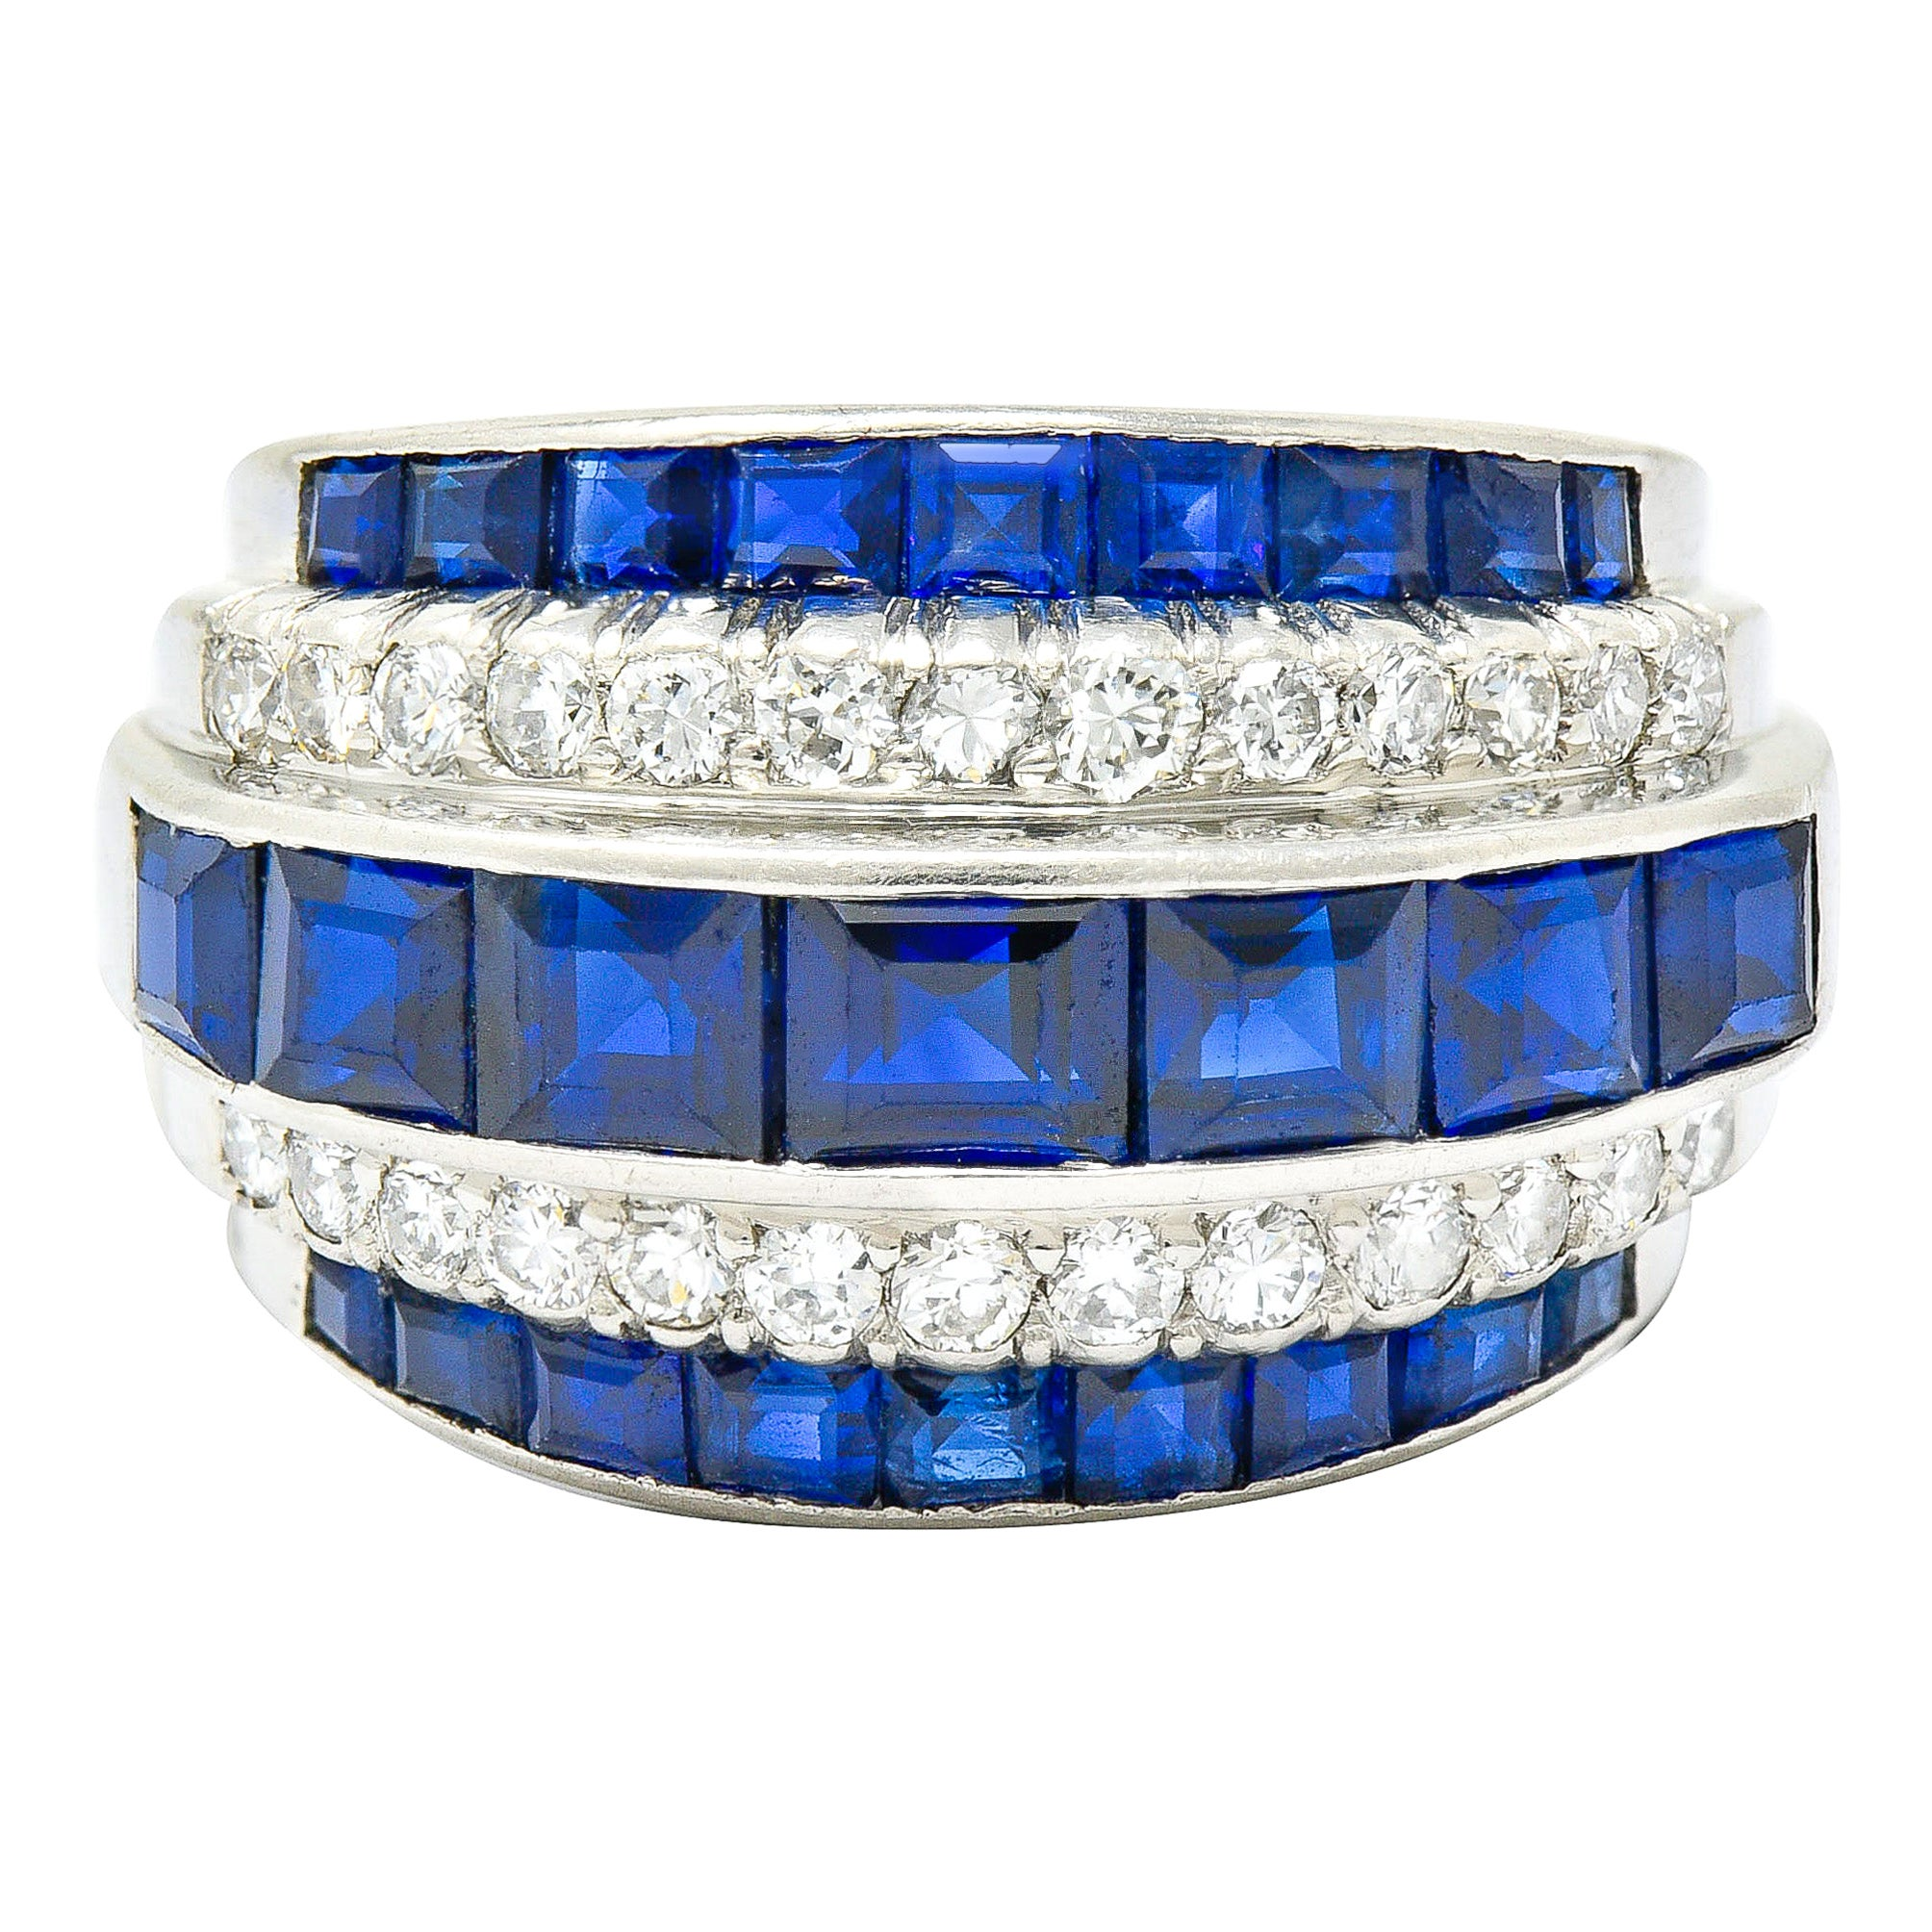 1950's Mid-Century 3.90 Carat Sapphire Diamond Platinum Band Ring